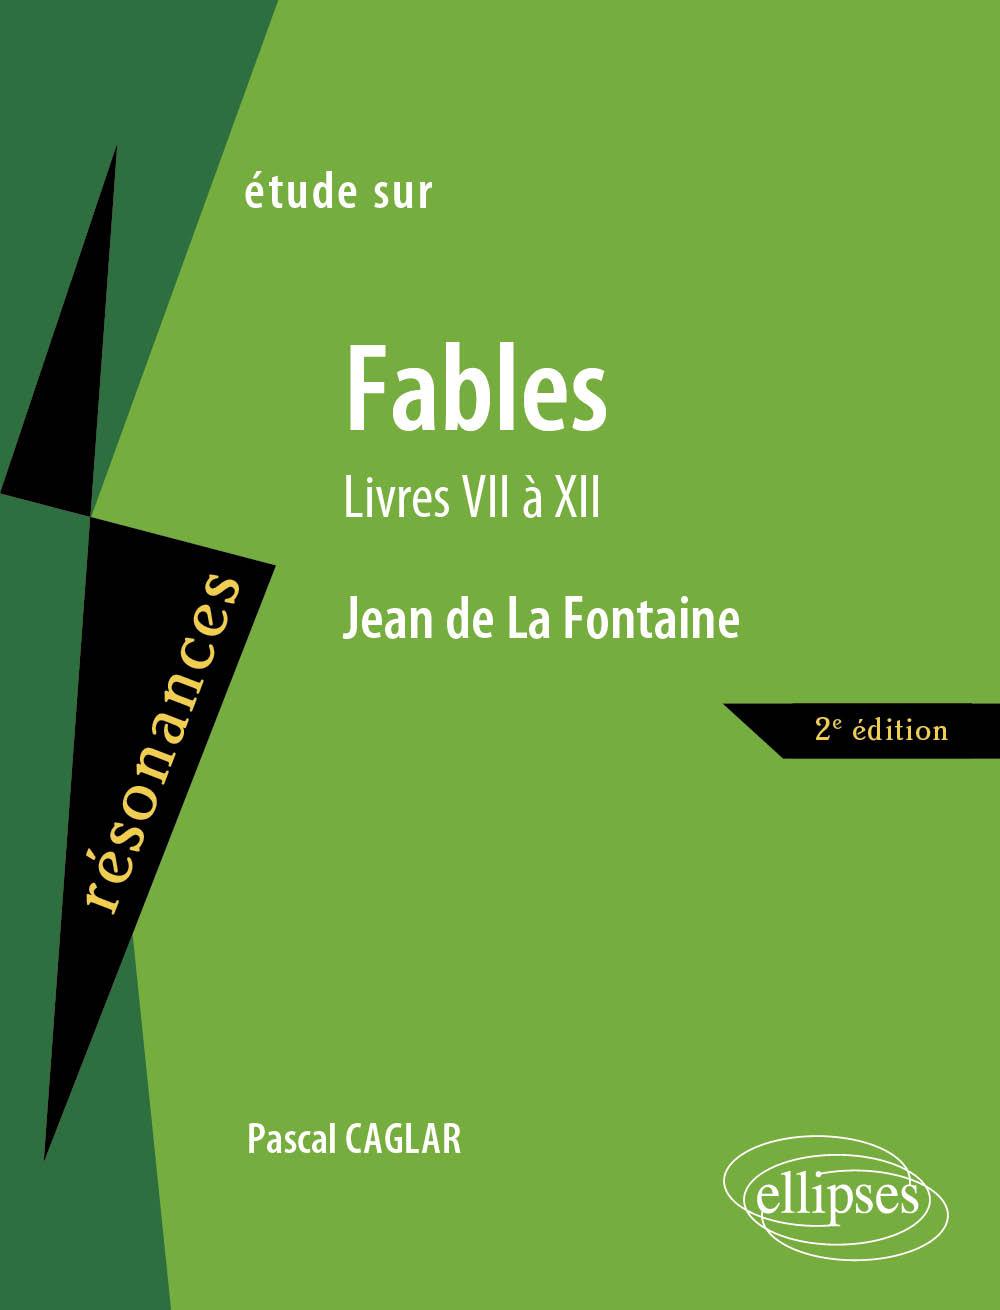 dissertation literature francaise